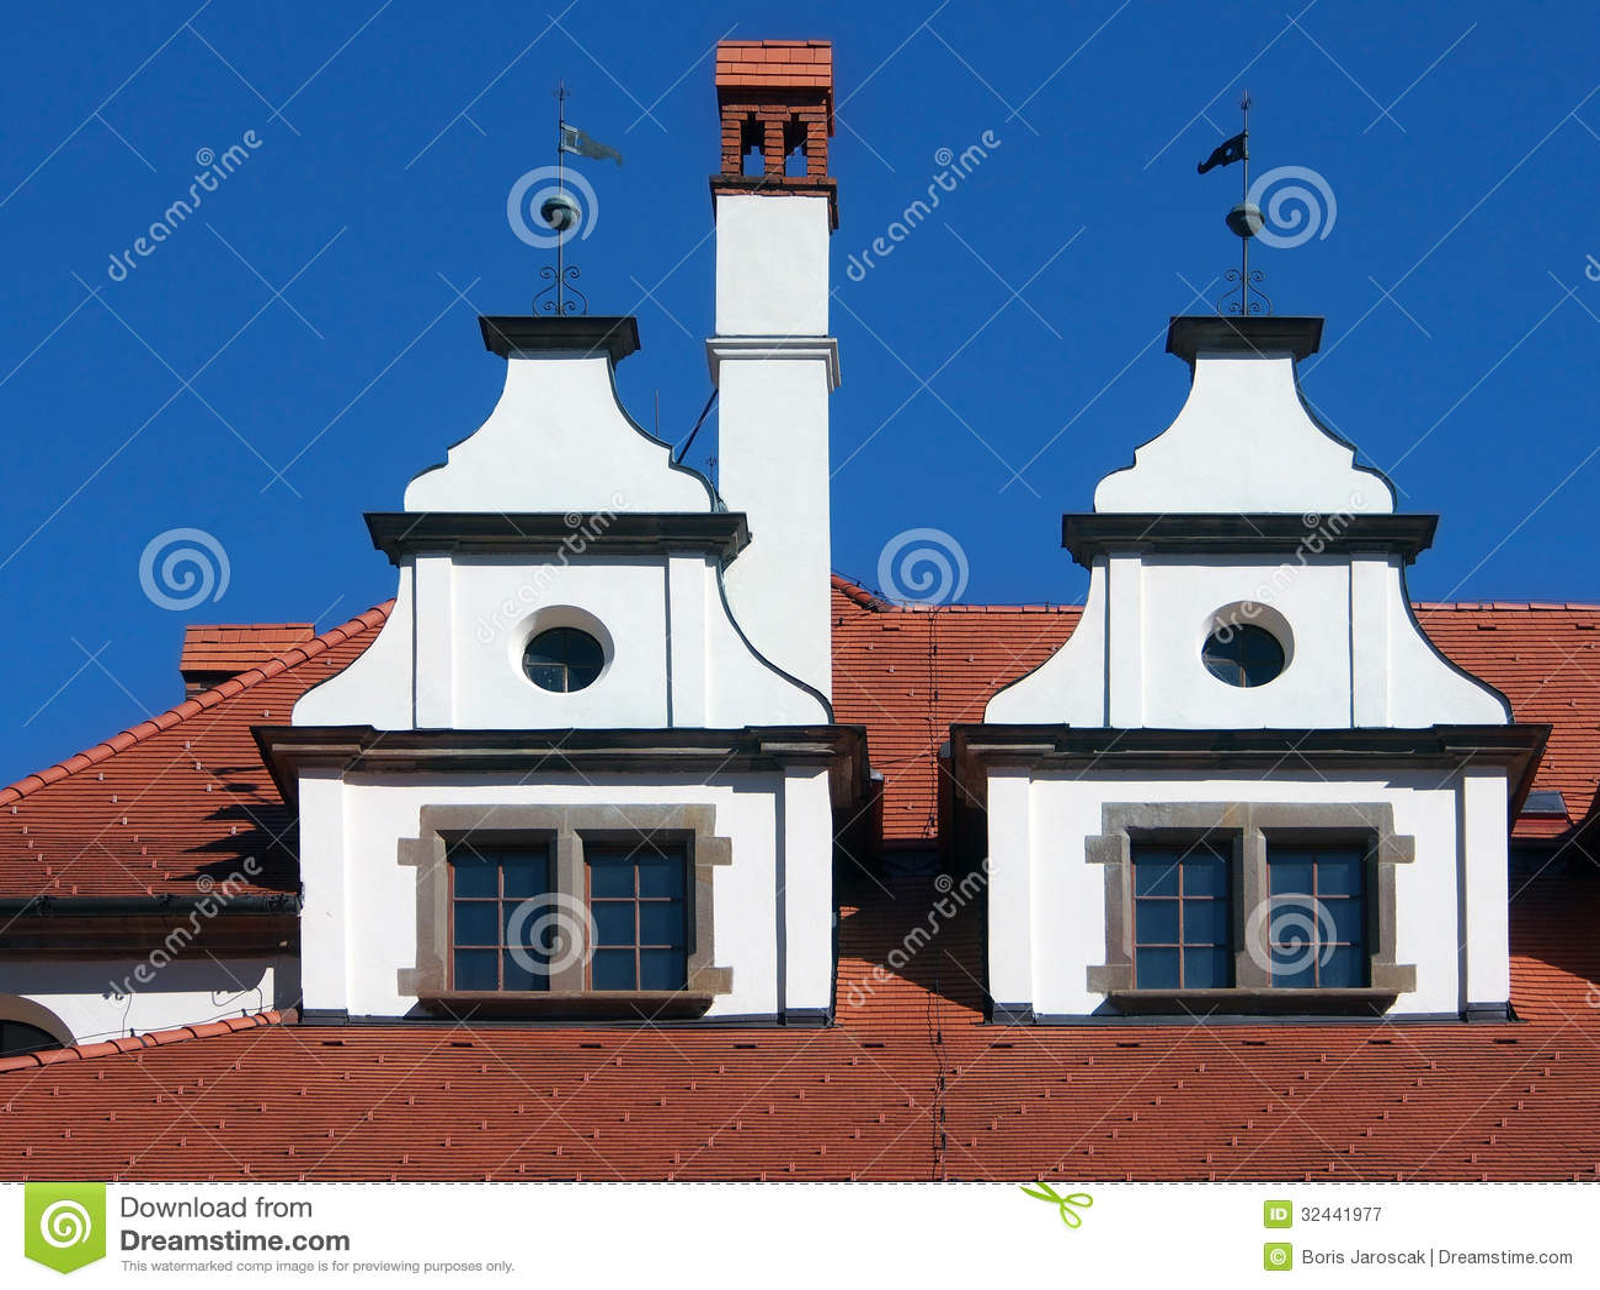 Unique medieval roofs in Levoca